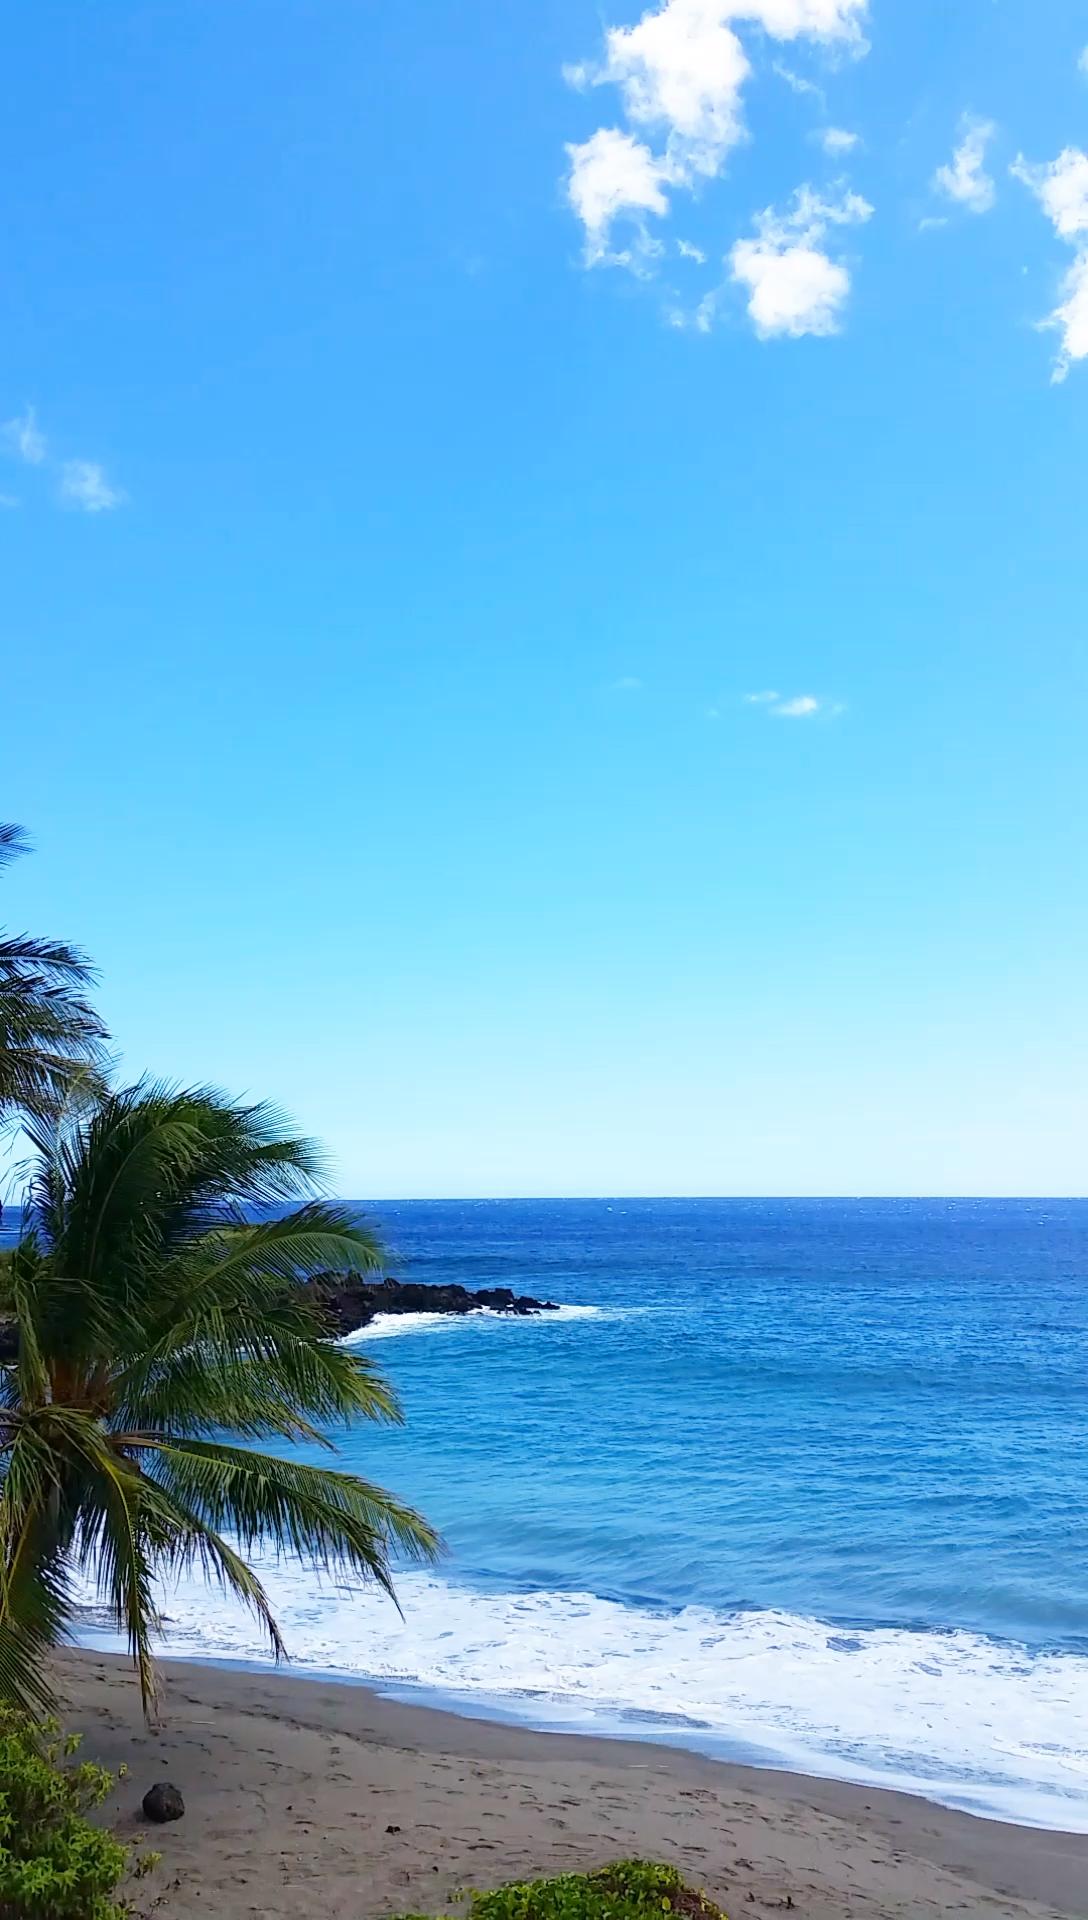 Tropical island beach Travel Hawaii travel ideas. pohue bay beach hike. Outdoor beach travel tips. beautiful places for world bucket list, wanderlust inspiration, tropical islands.